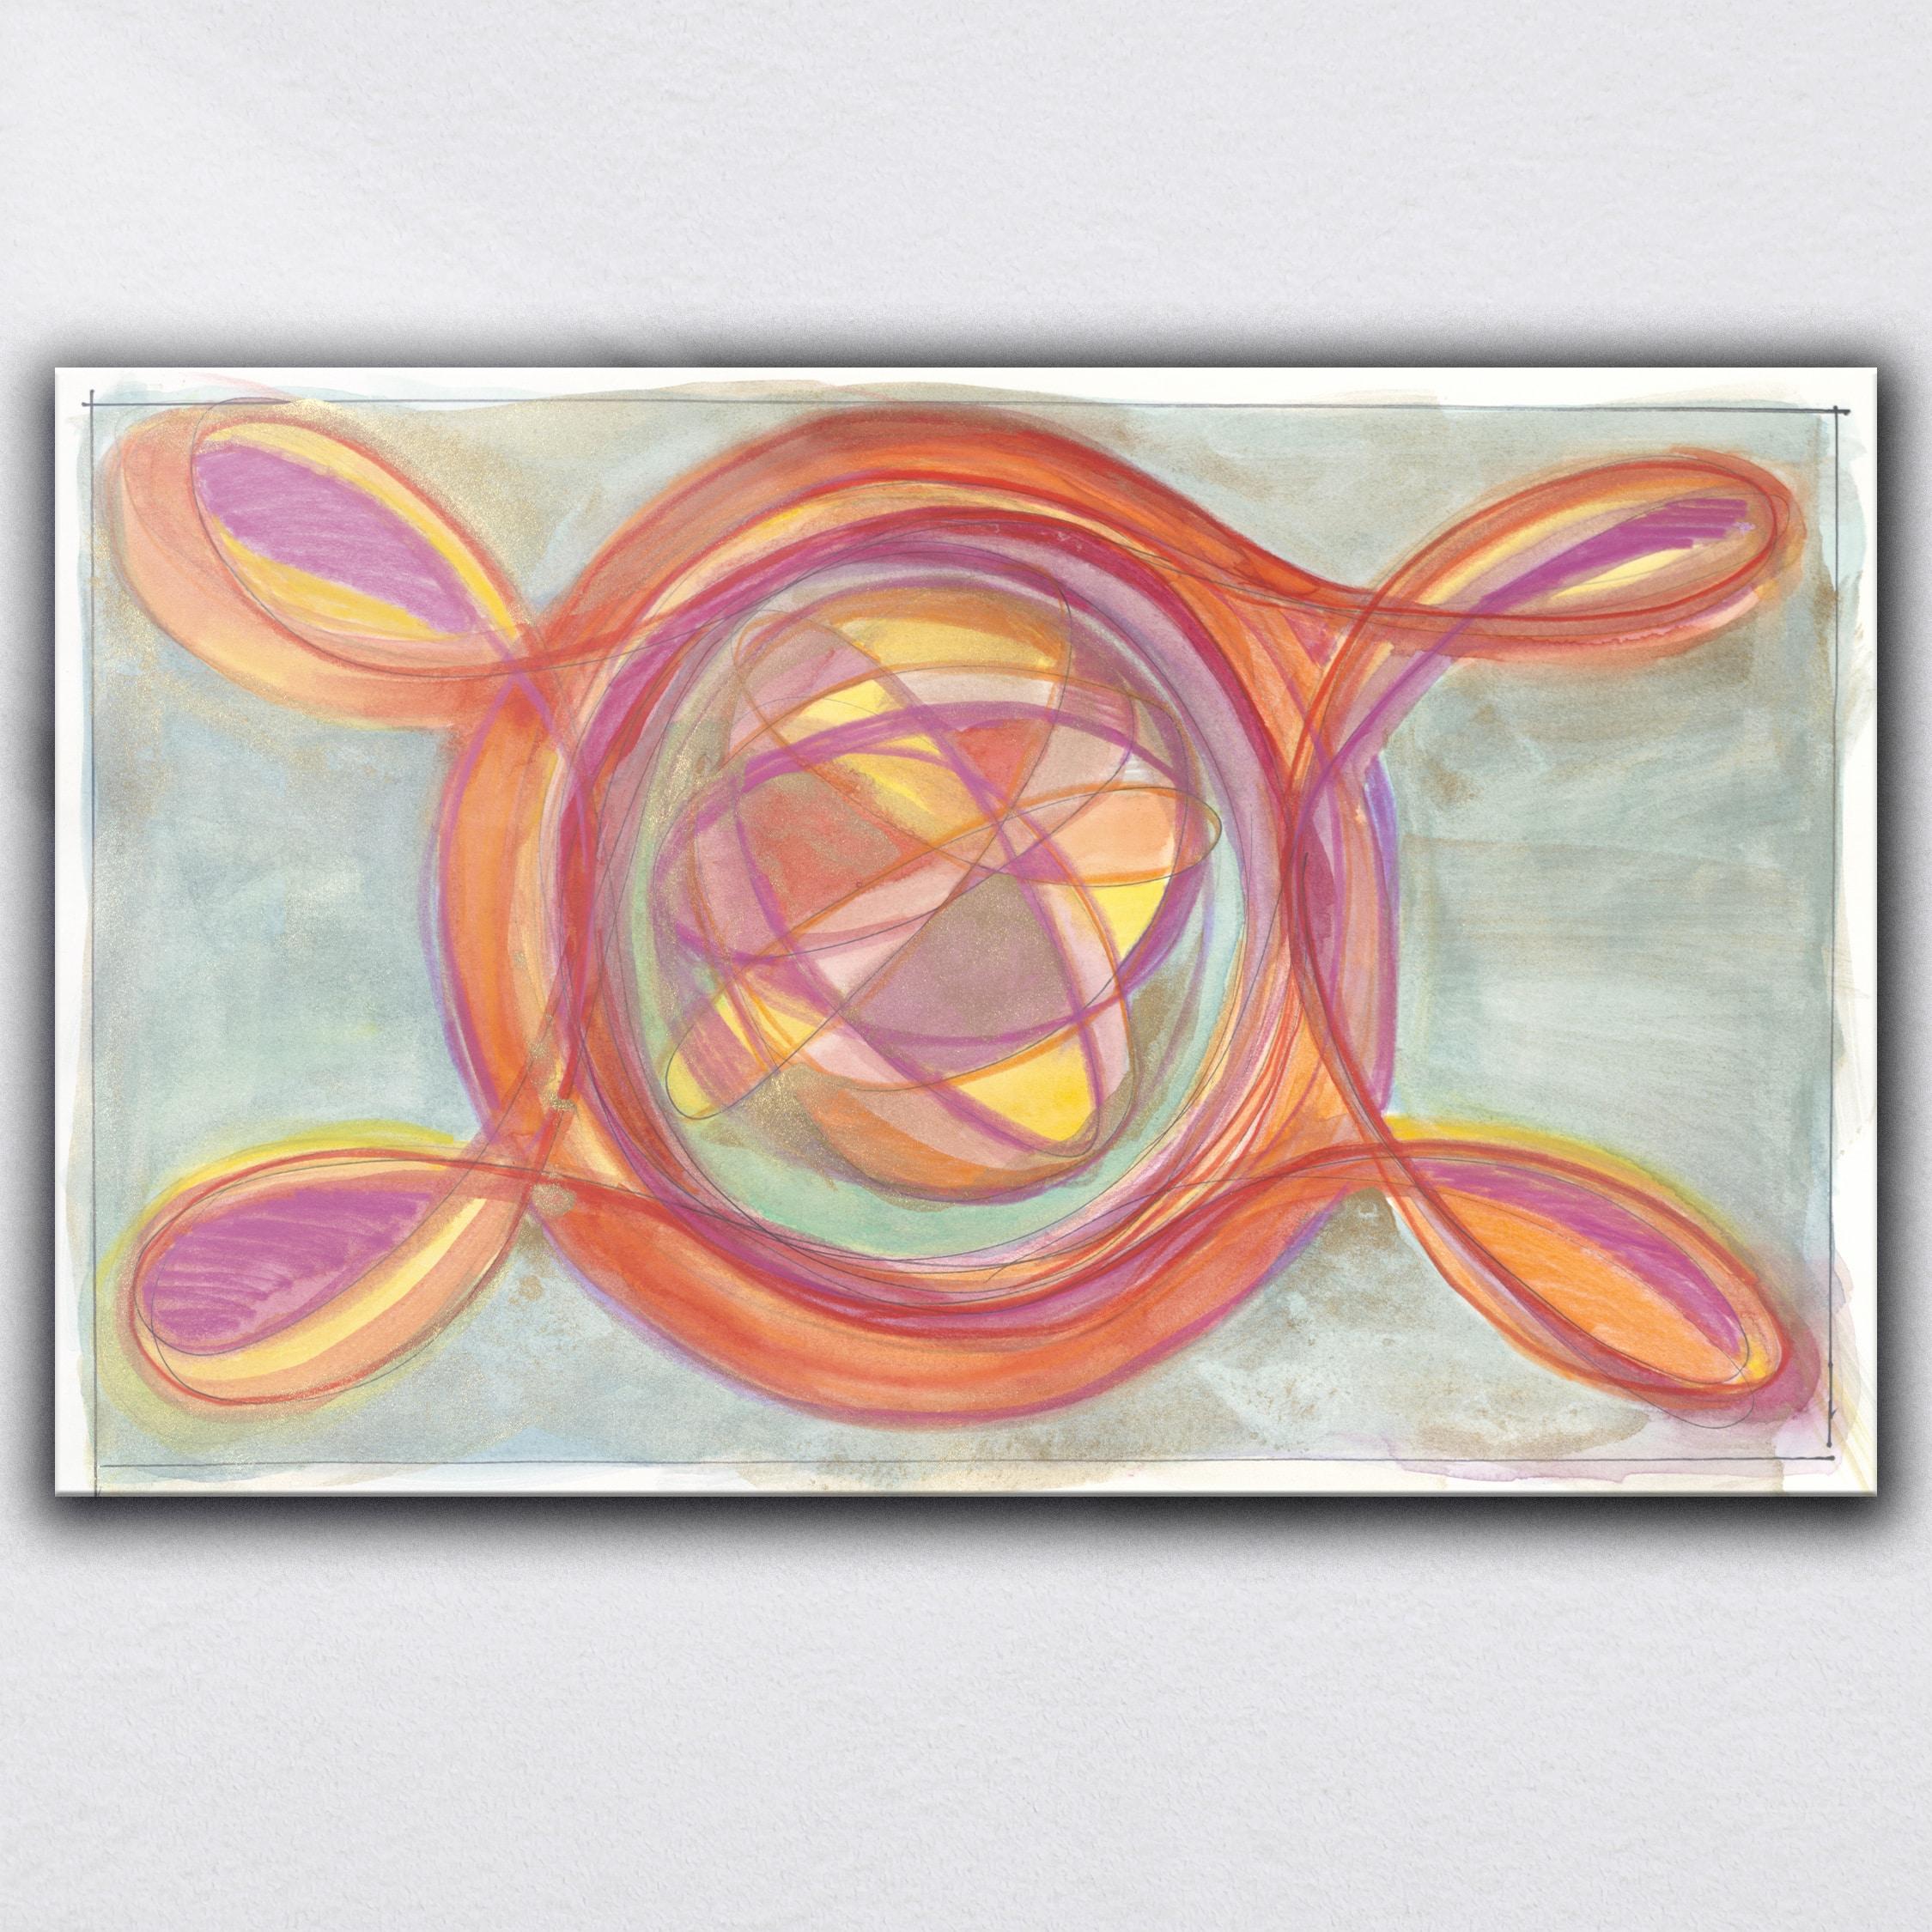 """Atomic Love""  2020     Original Painting 12 x 20 inches Watercolor, iridescent and metallic media on Moleskin Folio Paper"